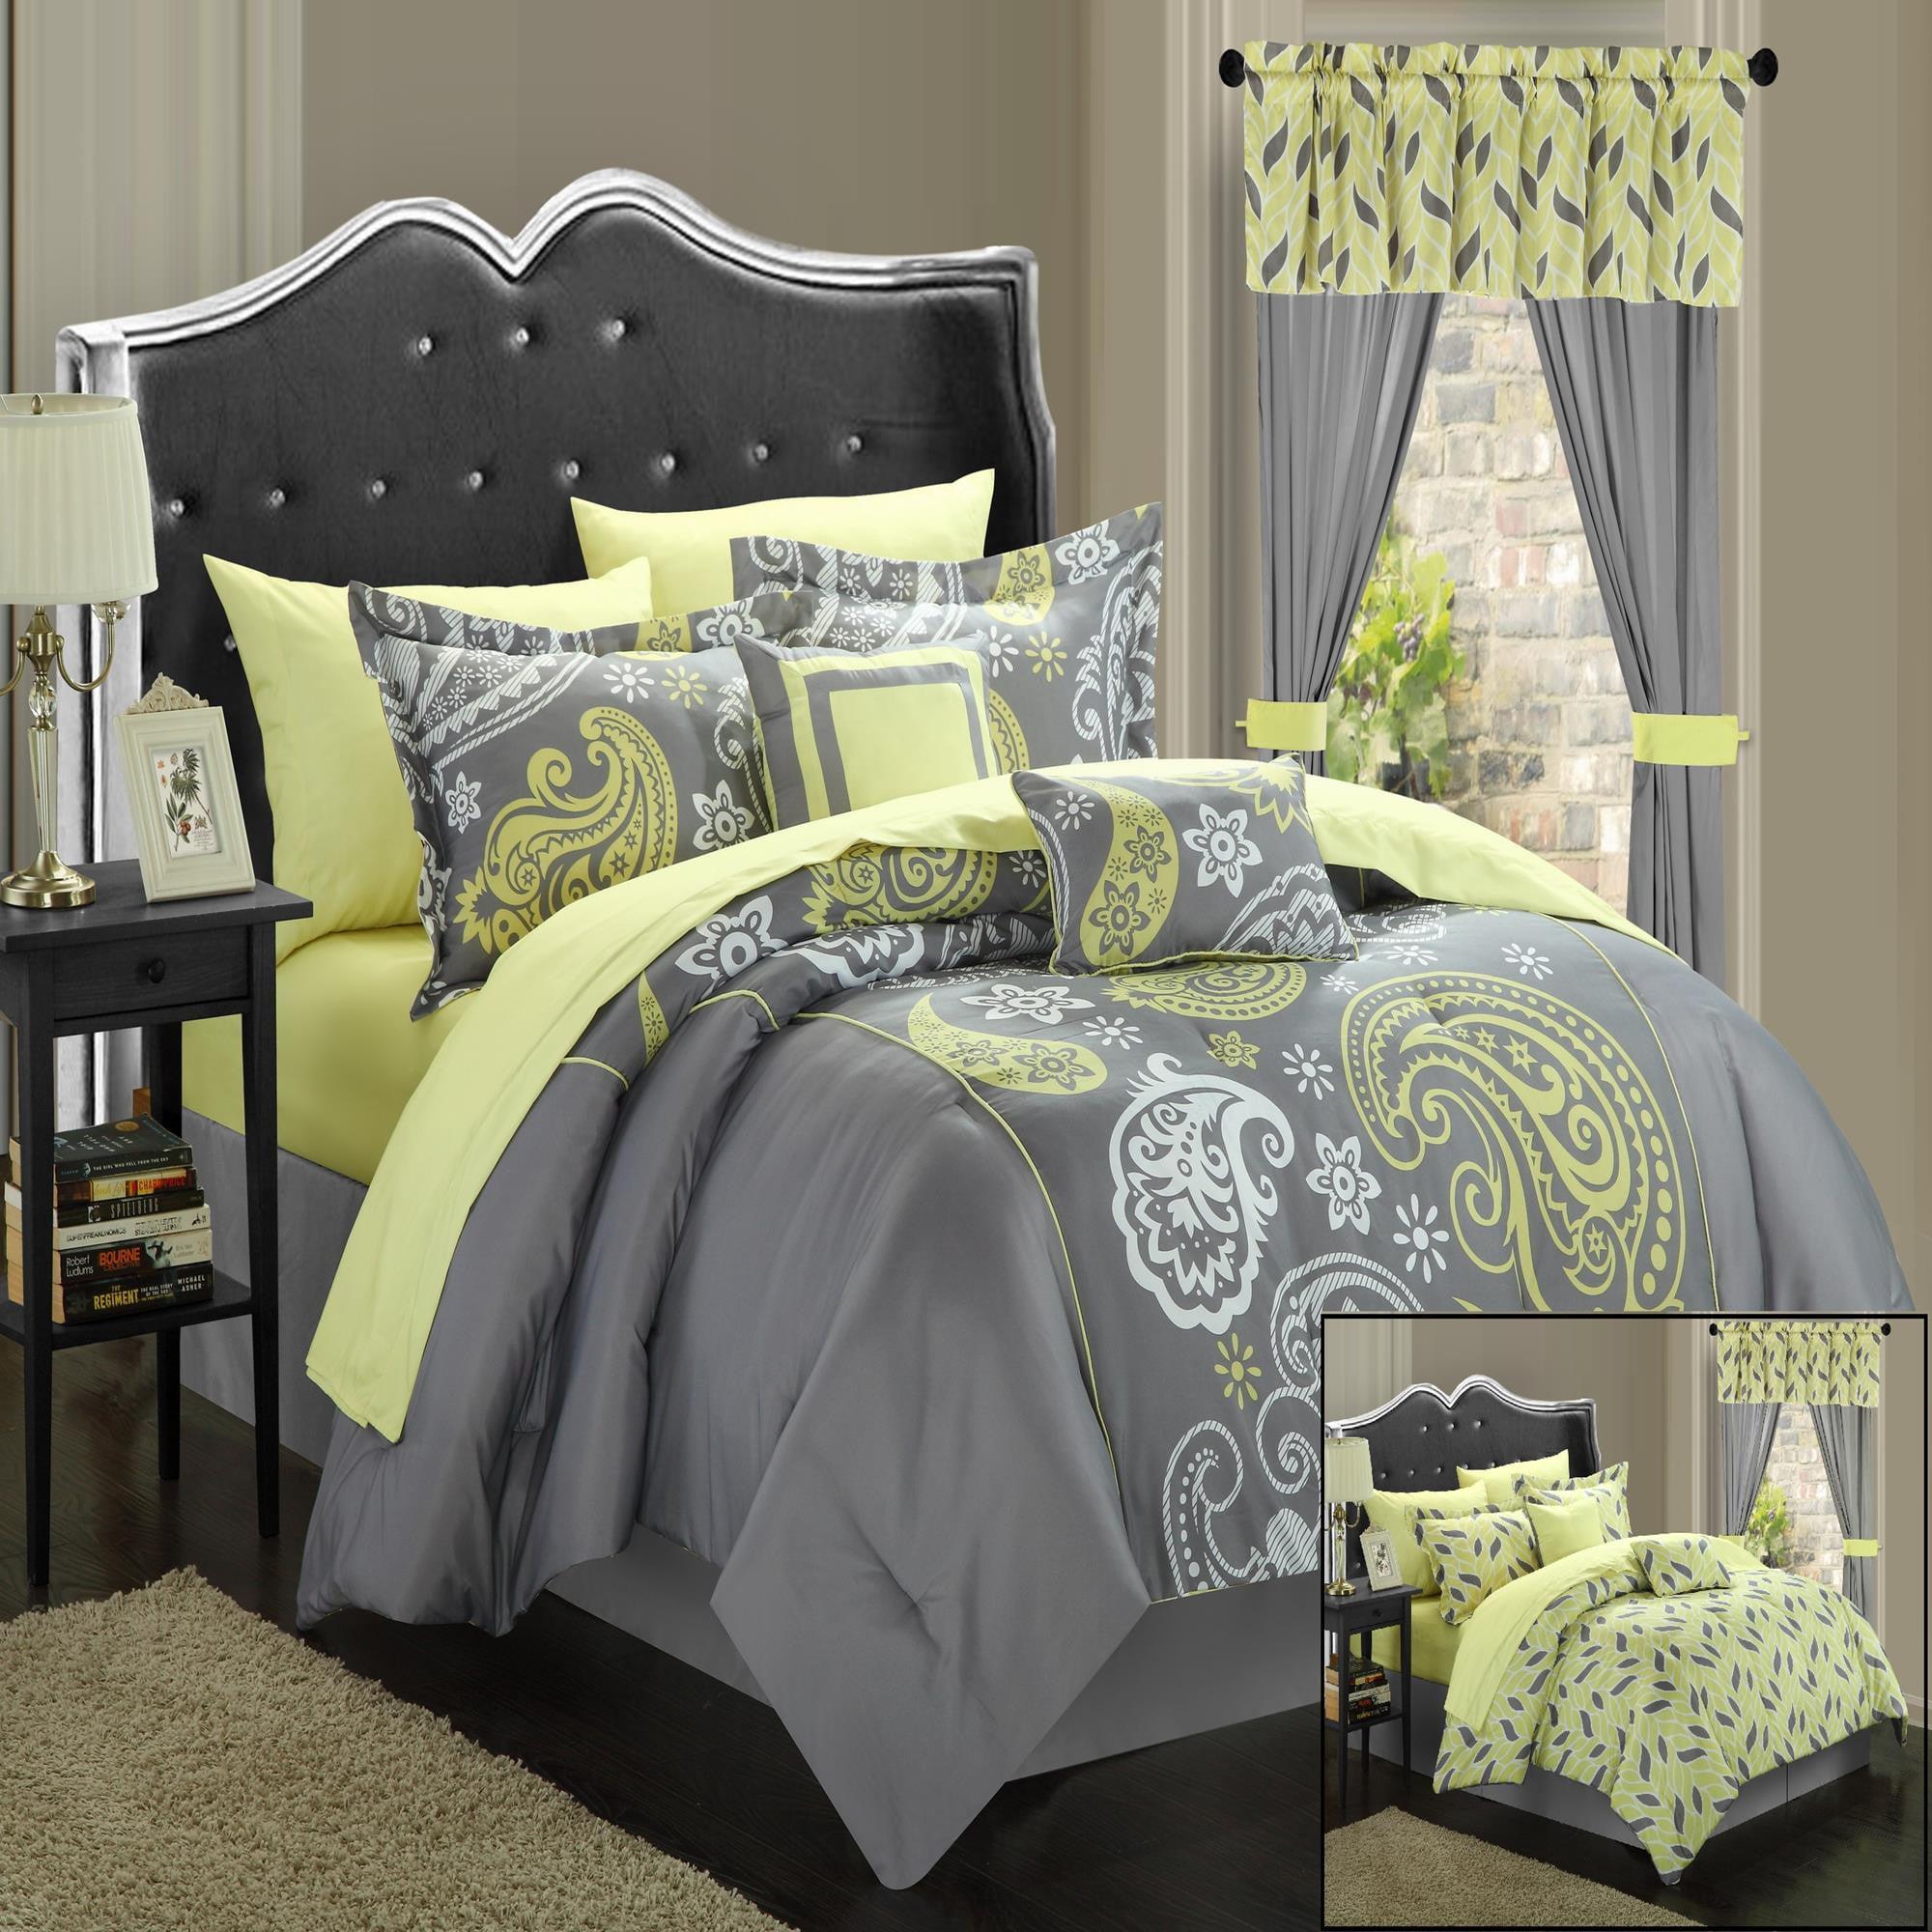 Olivia Paisley Print Grey & Yellow 20 Piece Mega Comforter Bed In A Bag Set